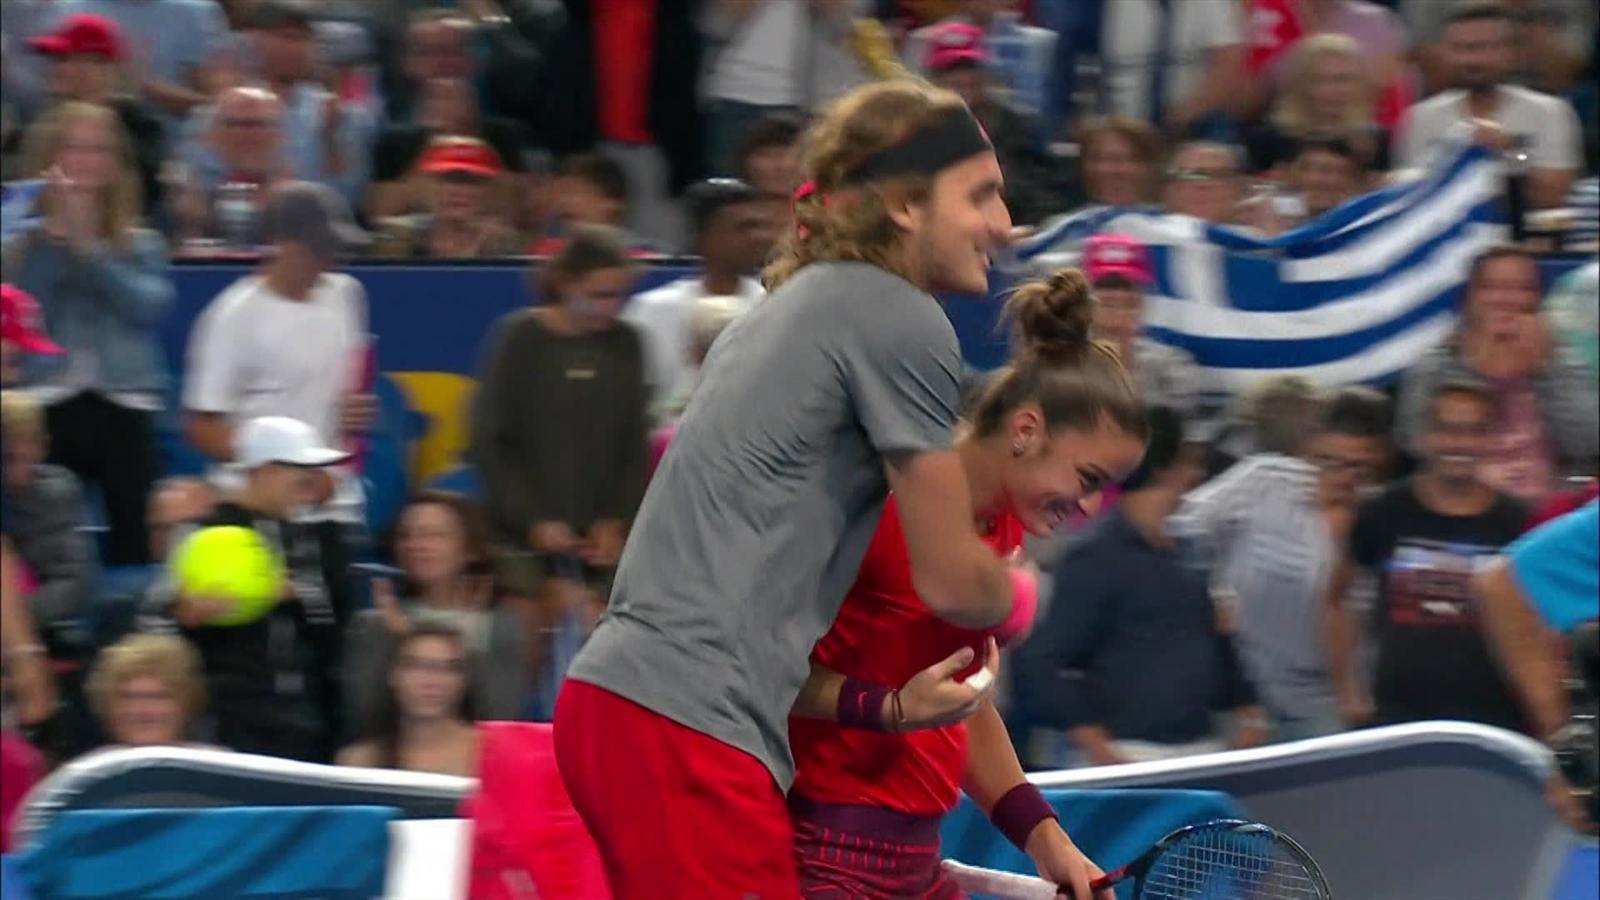 VIDEO - Maria Sakkari and Stefanos Tsitsipas down Belinda Bencic and Roger  Federer - Hopman Cup doubles - Video Eurosport